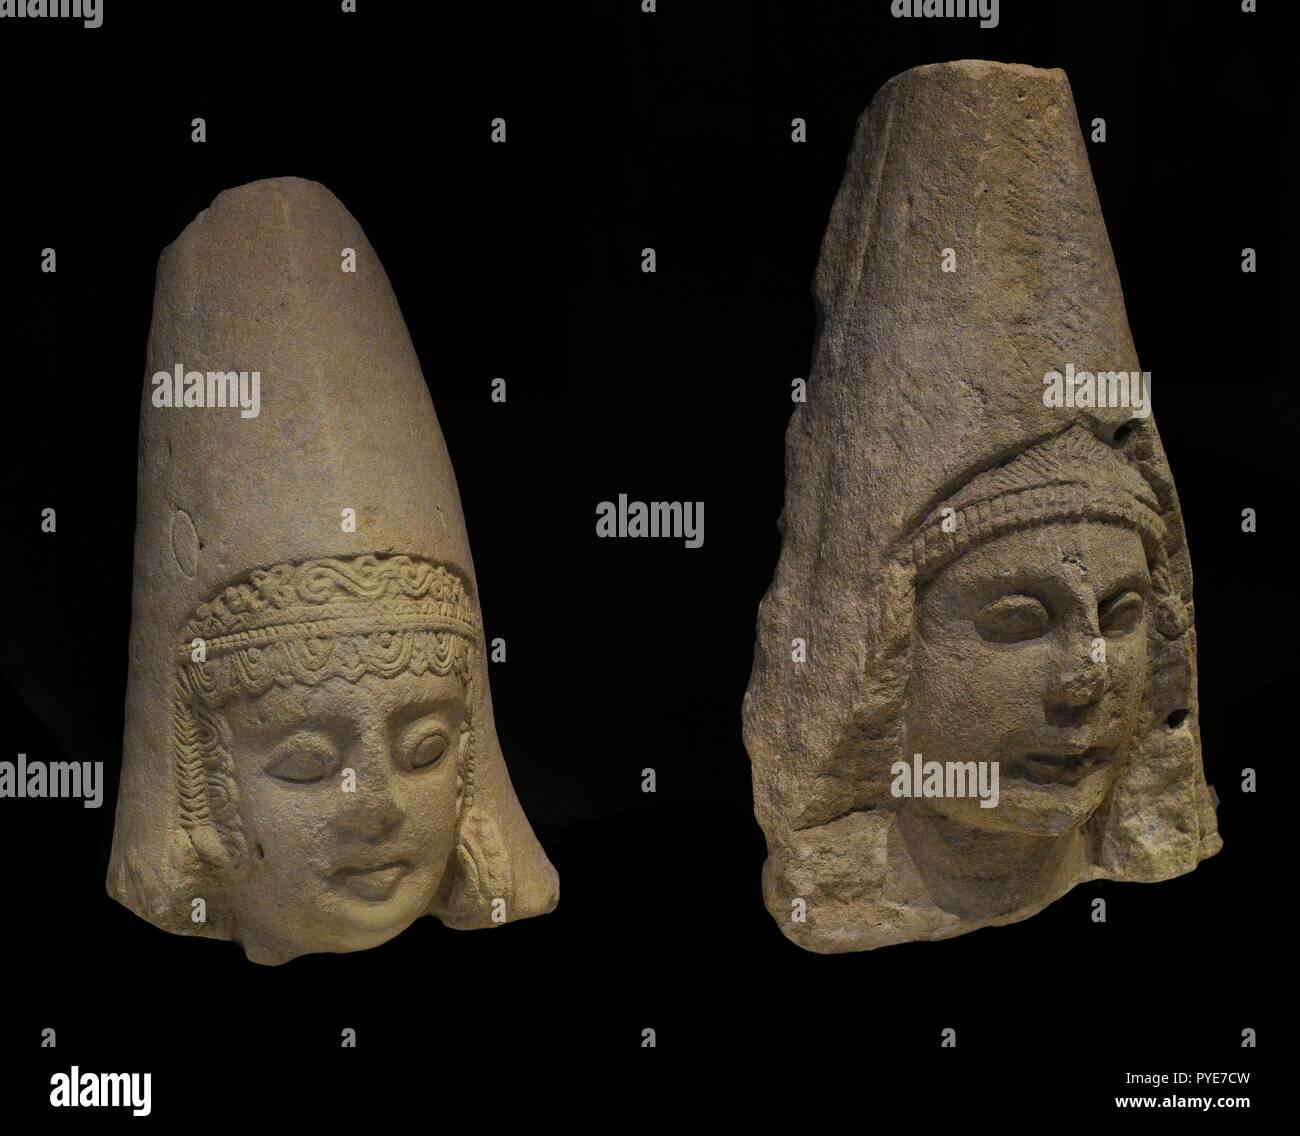 Cultura Iberica Cabezas Femeninas Siglo Ii A C Piedra Caliza